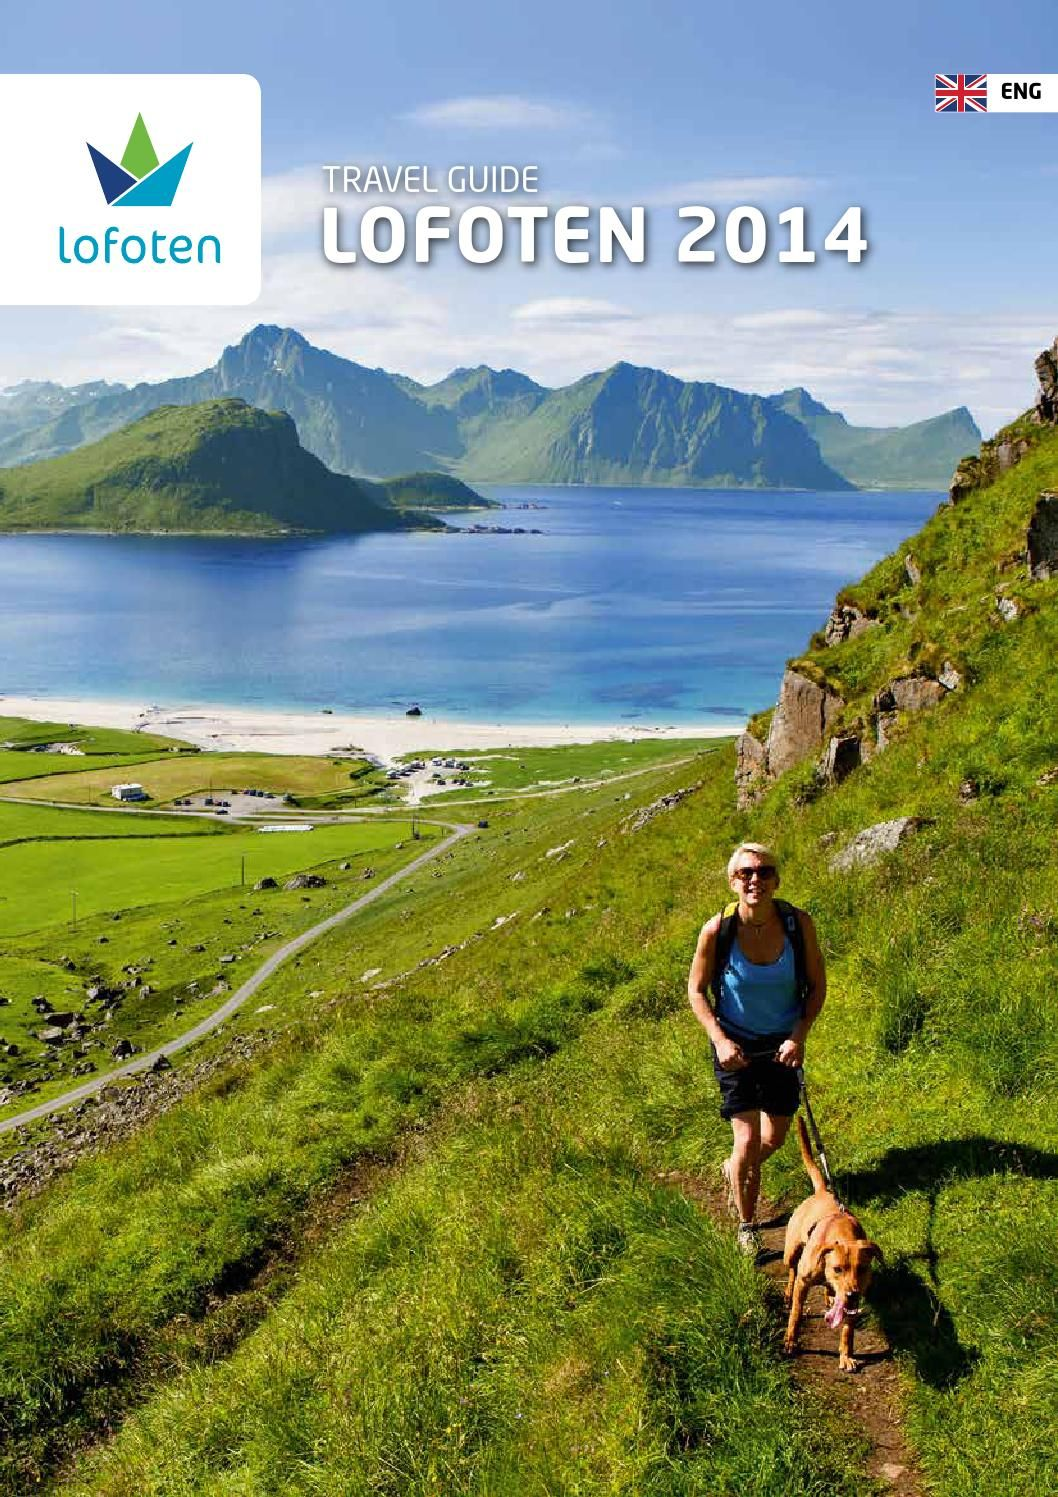 Lofoten 2014 - ENGELSK